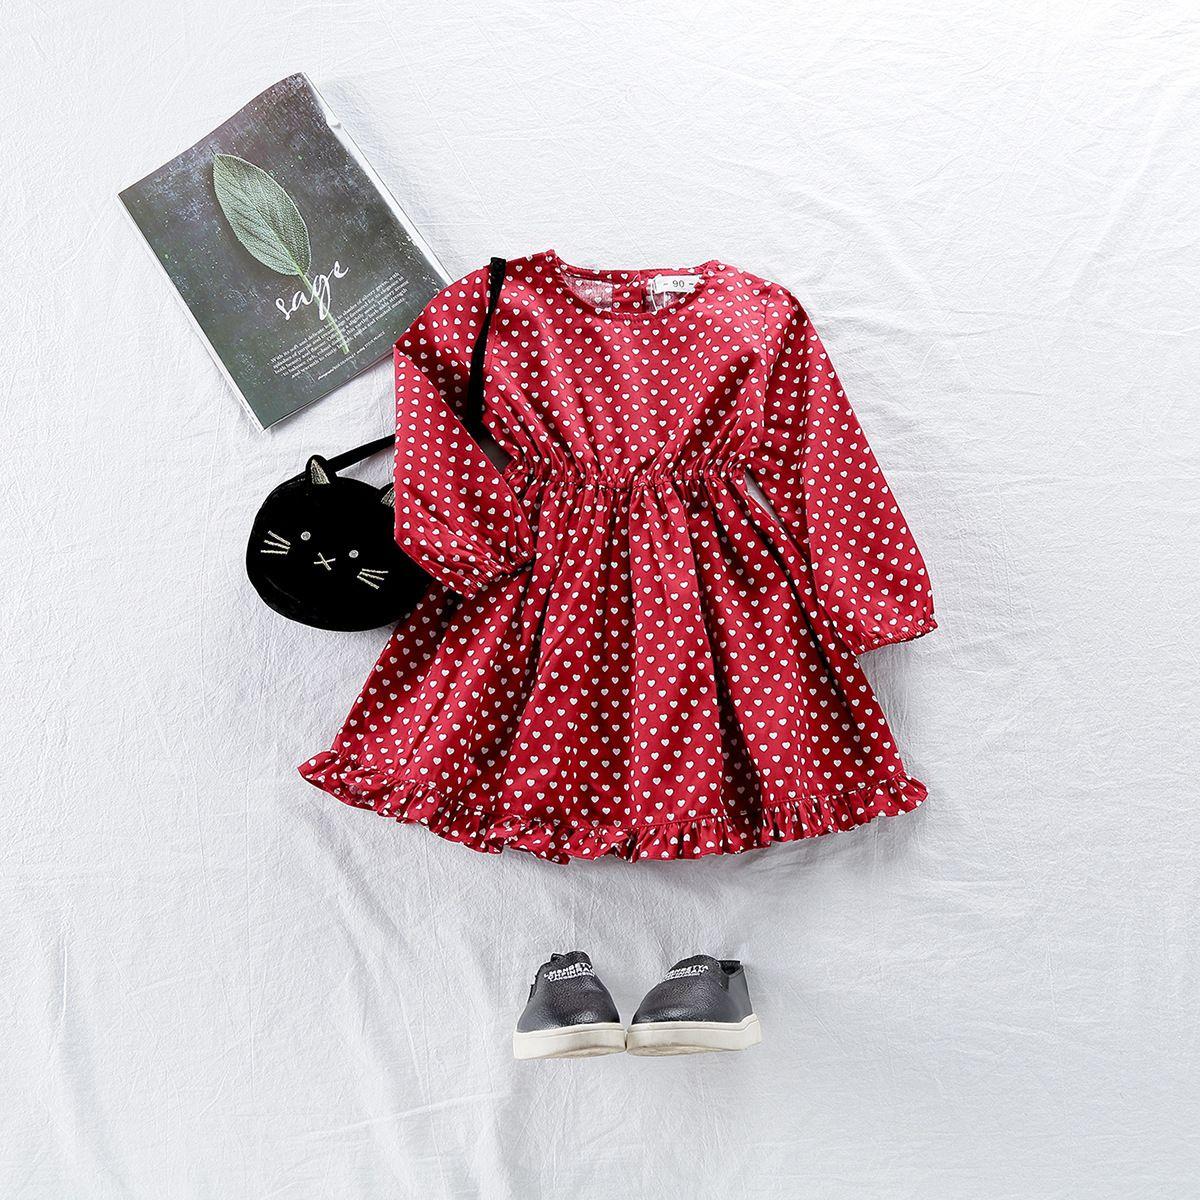 01cf57d11c91b 2019 New Spring Cotton Baby Girls Cartoon Love Heart Long Sleeves Dress  Children s Clothing Kids Princess Dresses Casual Clothes